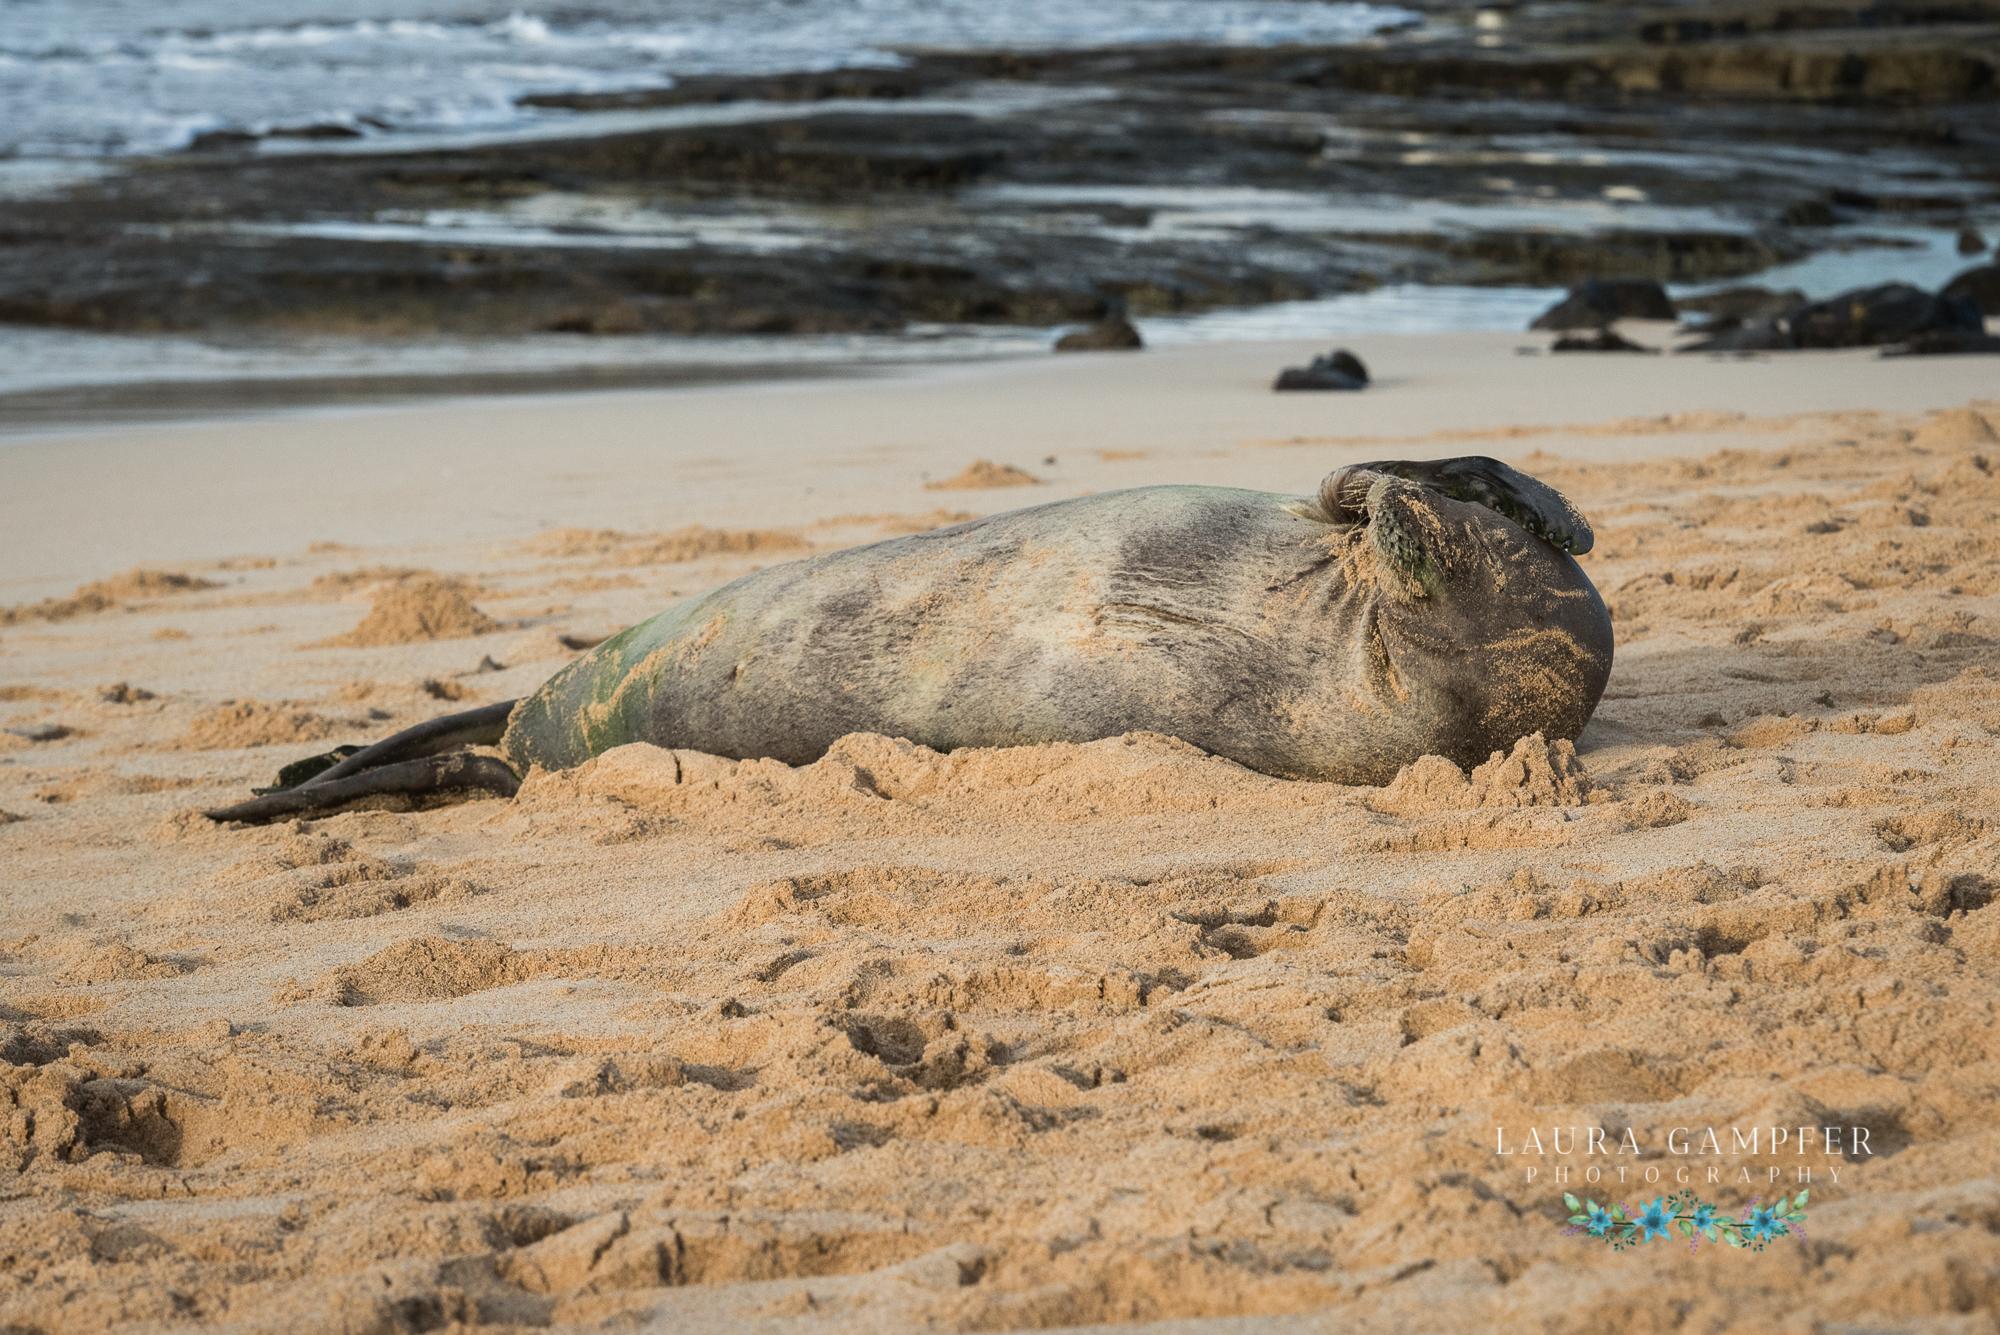 hawaiian monk seal kauai laura gampfer photography